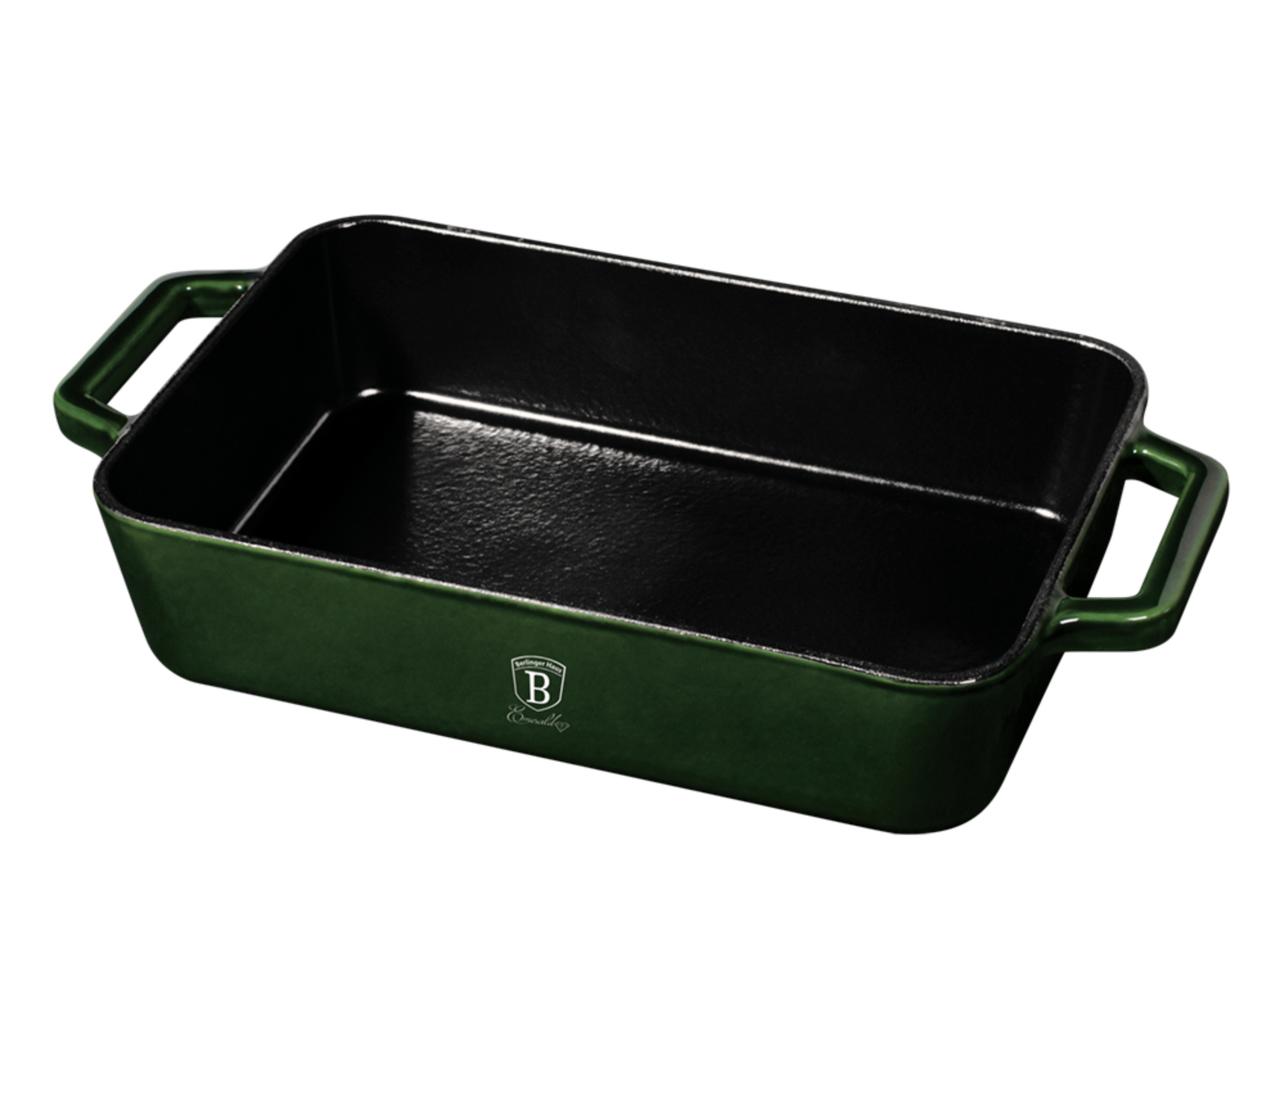 Чугунный ростер 30x20x7 см Berlinger Haus Metallic Line Emerald Edition BH-6506